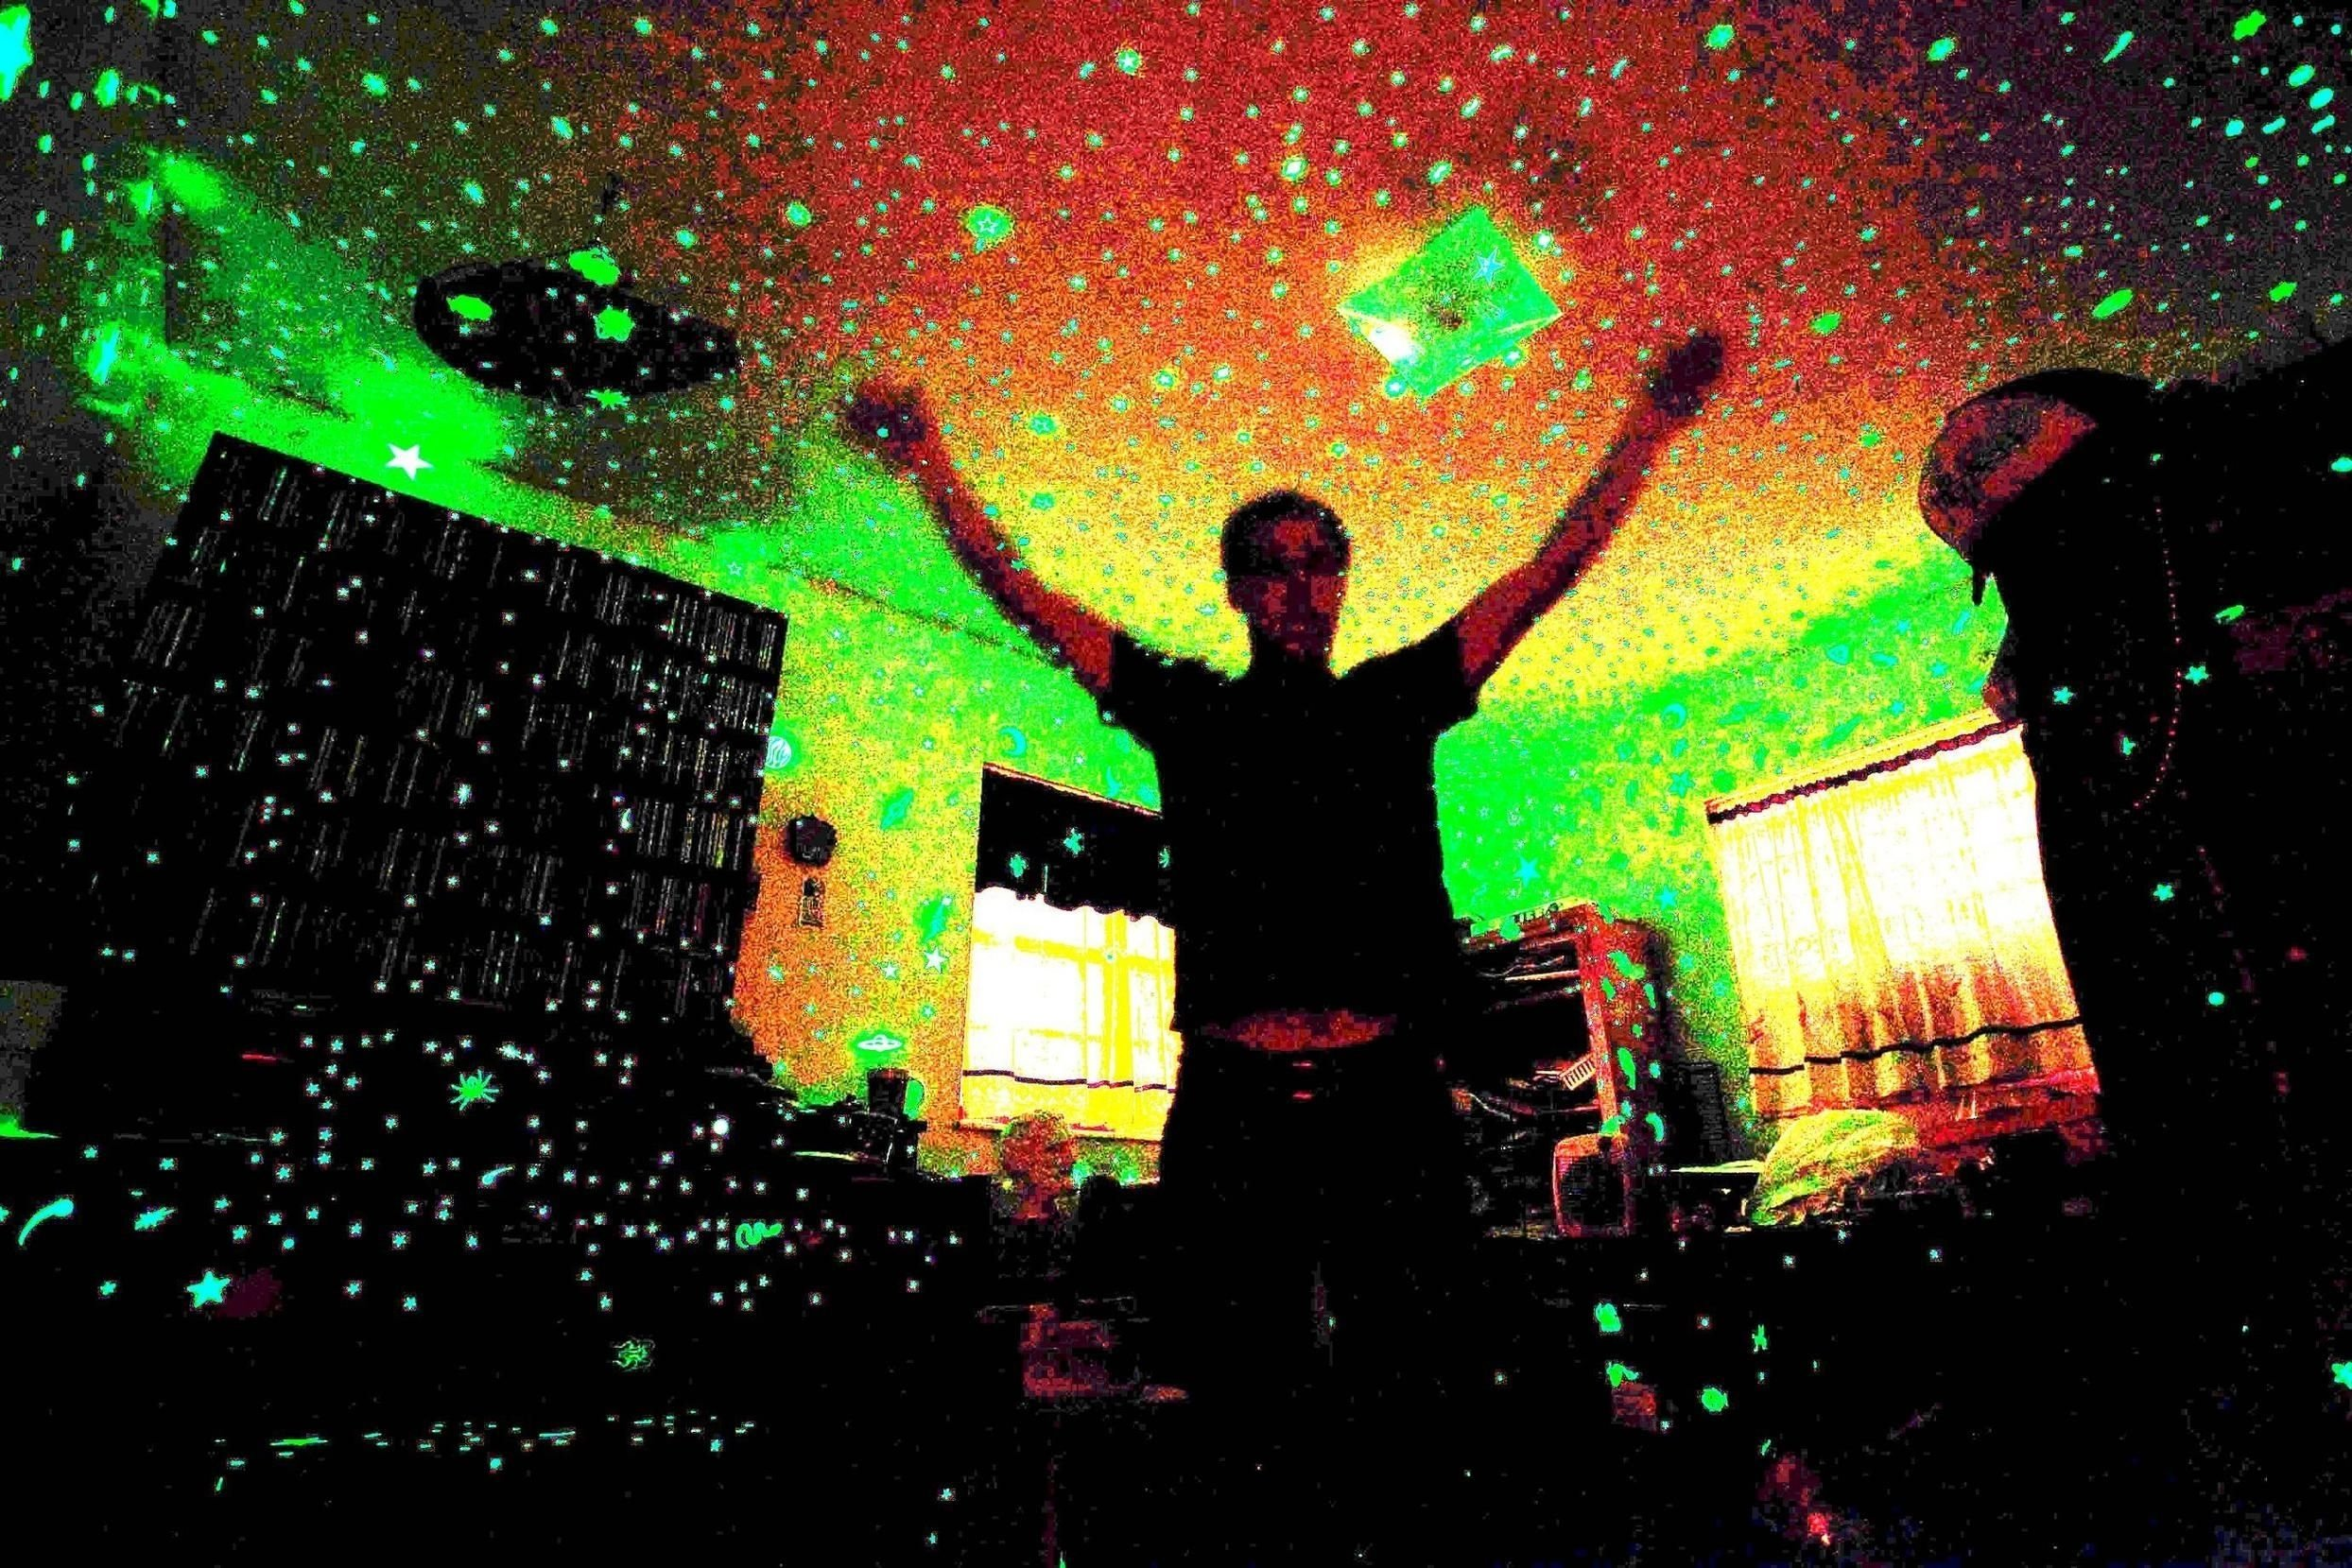 10 Stylish Glow In The Dark Room Ideas so cool glow in the dark room glow in the dark rooms 2020